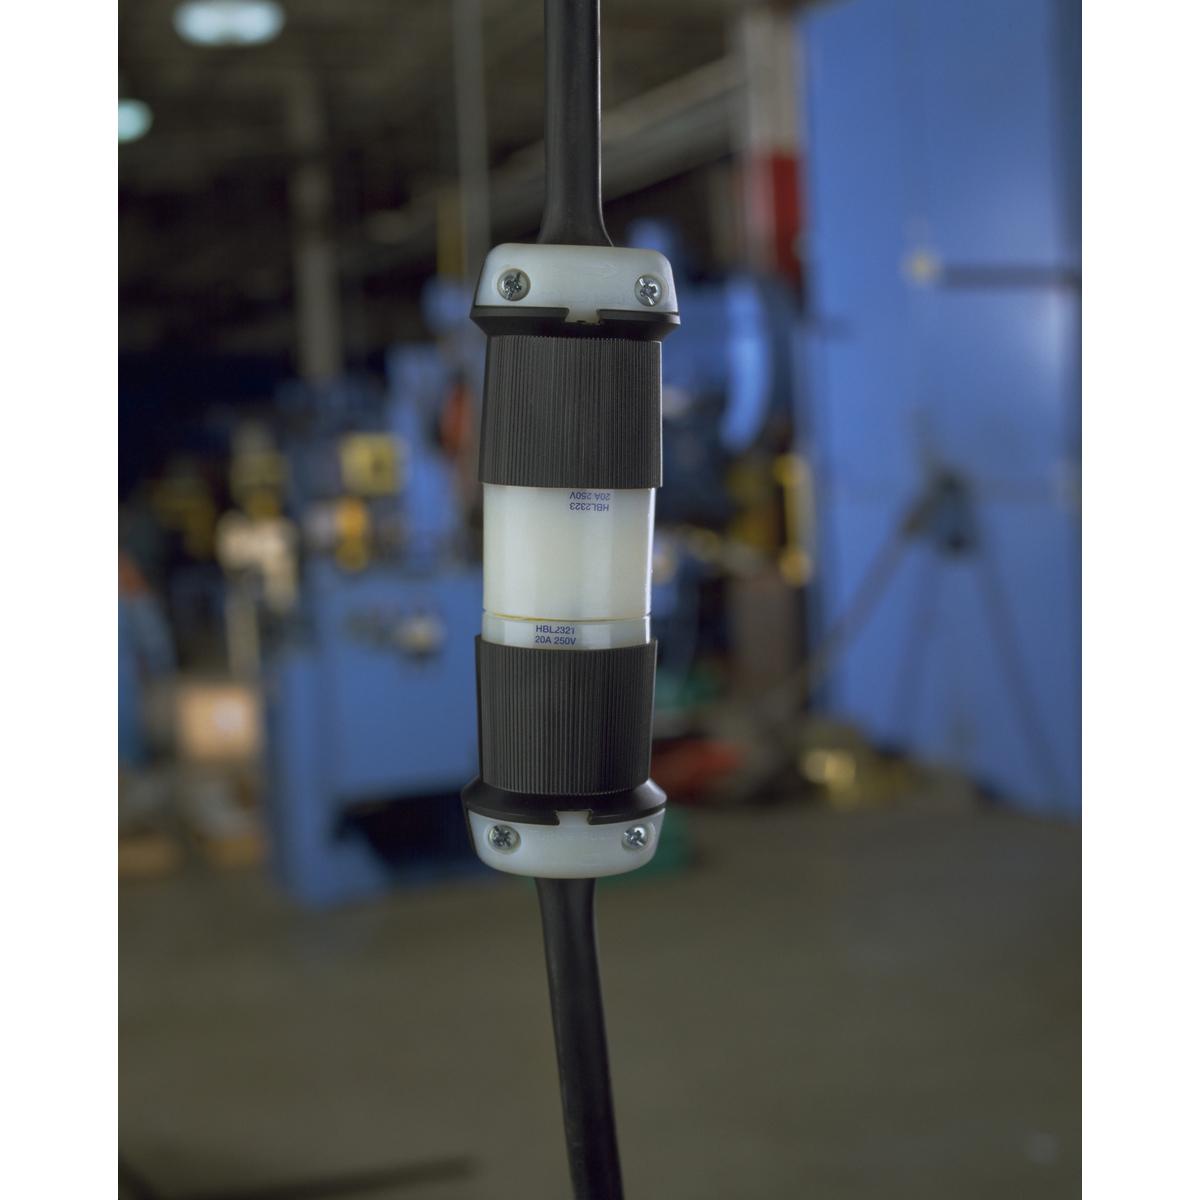 hight resolution of hbl2323 wiring device kellems hbl2323 wiring diagram